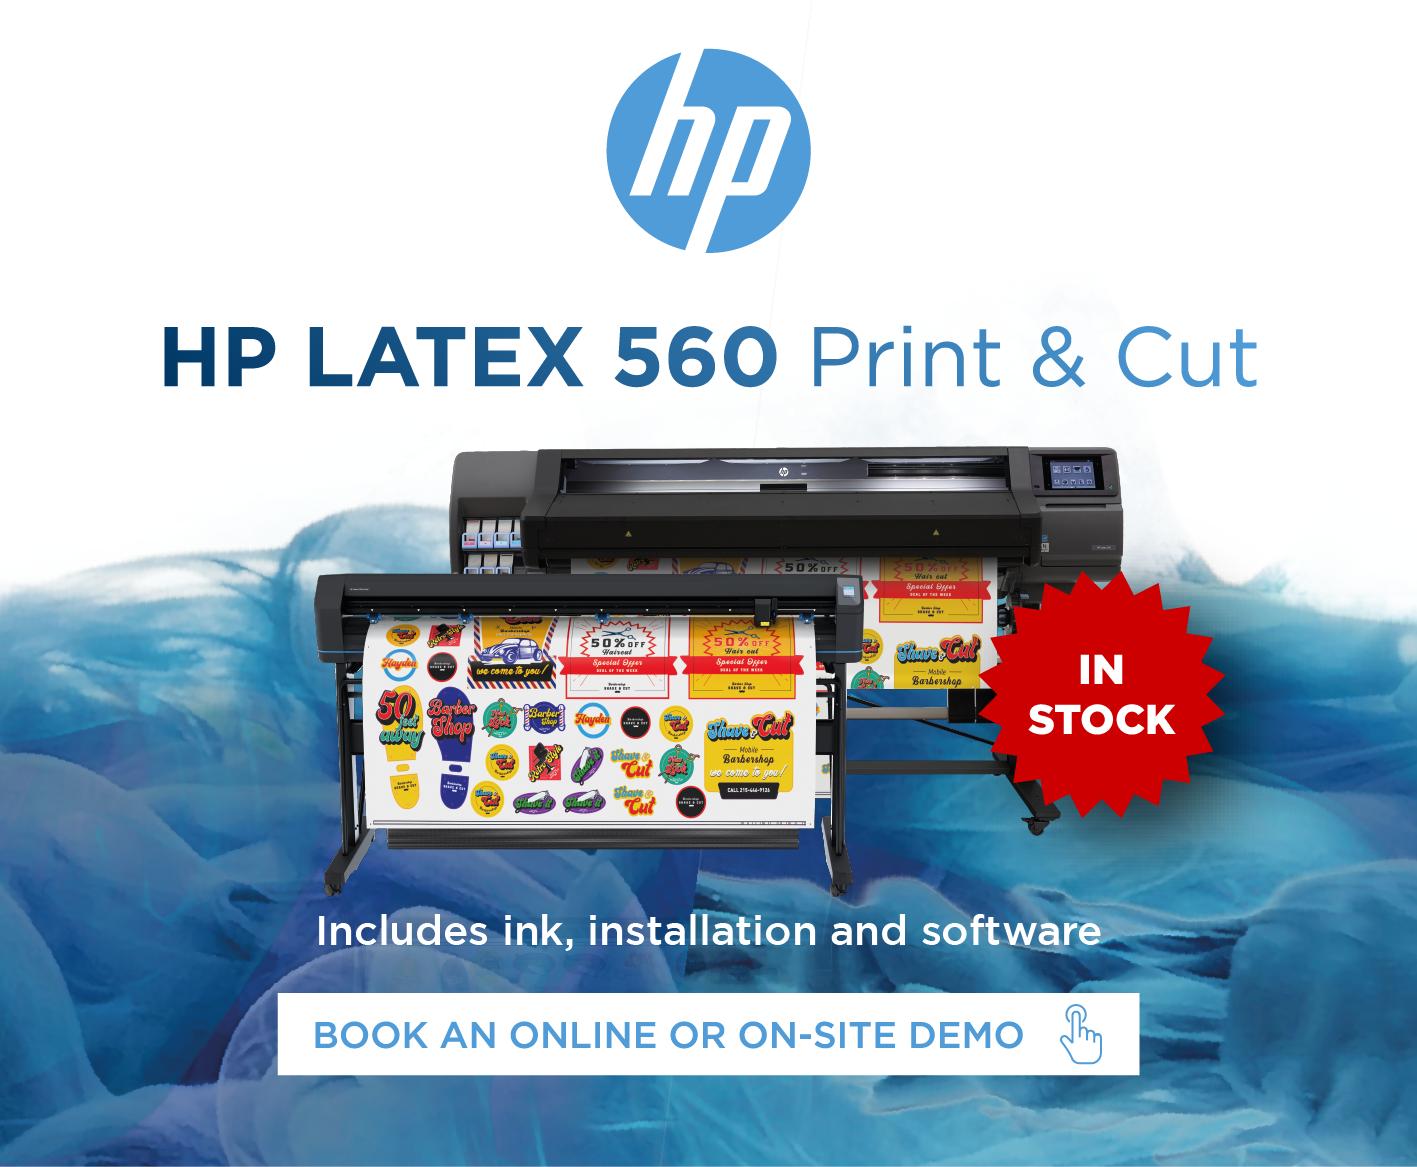 Midcomp-SideLarge-HPlatex560